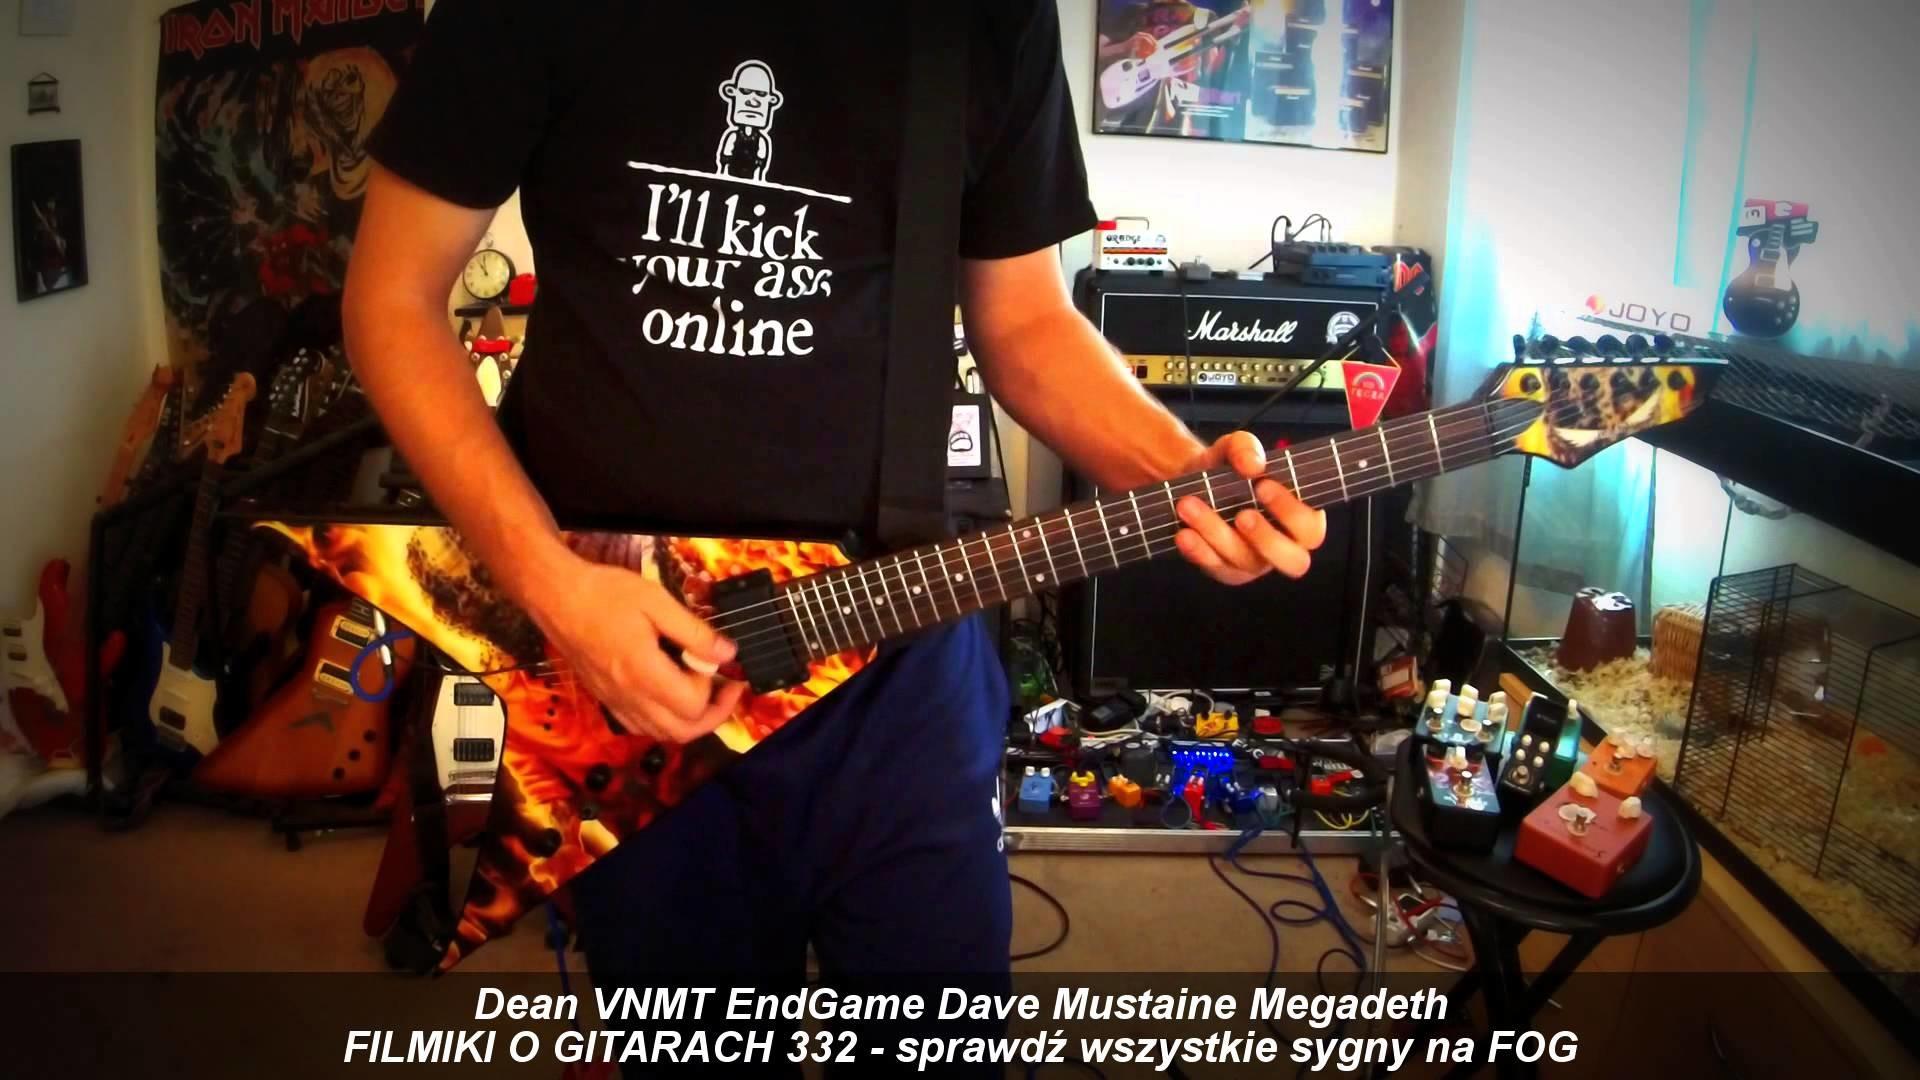 Res: 1920x1080, DEAN VNMT End Game Dave Mustaine Megadeth - FOG lubi sygny :) - FILMIKI O  GITARACH 332